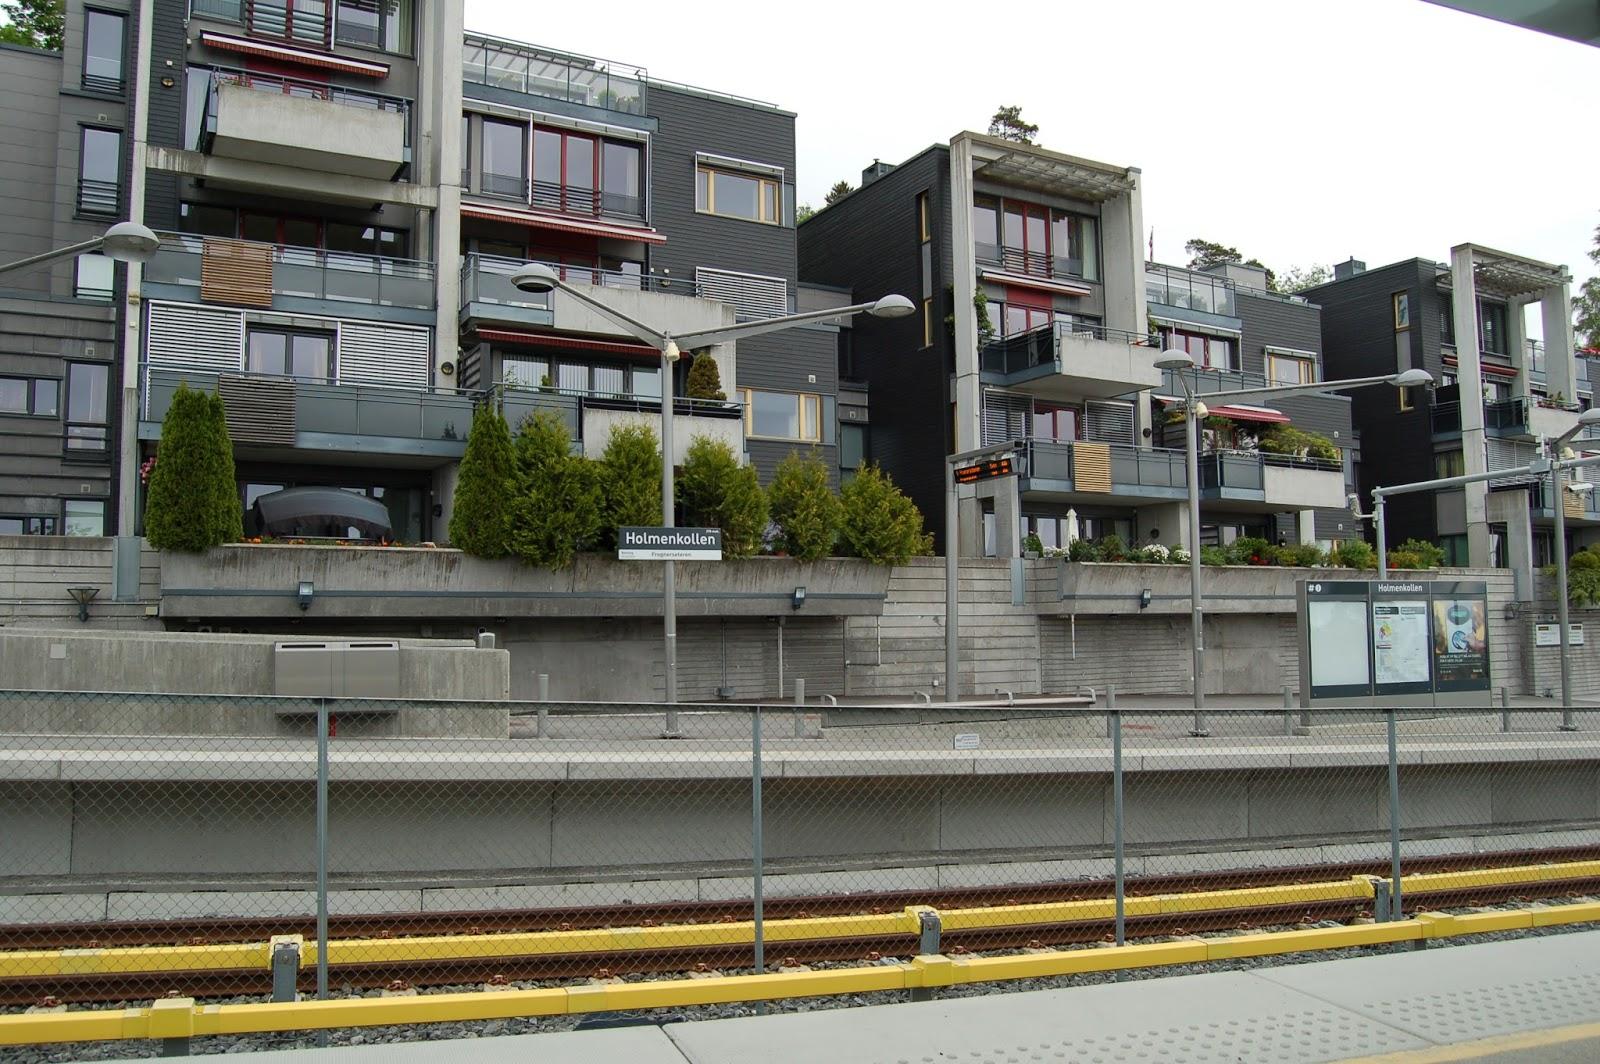 Norwegia, Oslo, Holemnkollen, przystanek metra